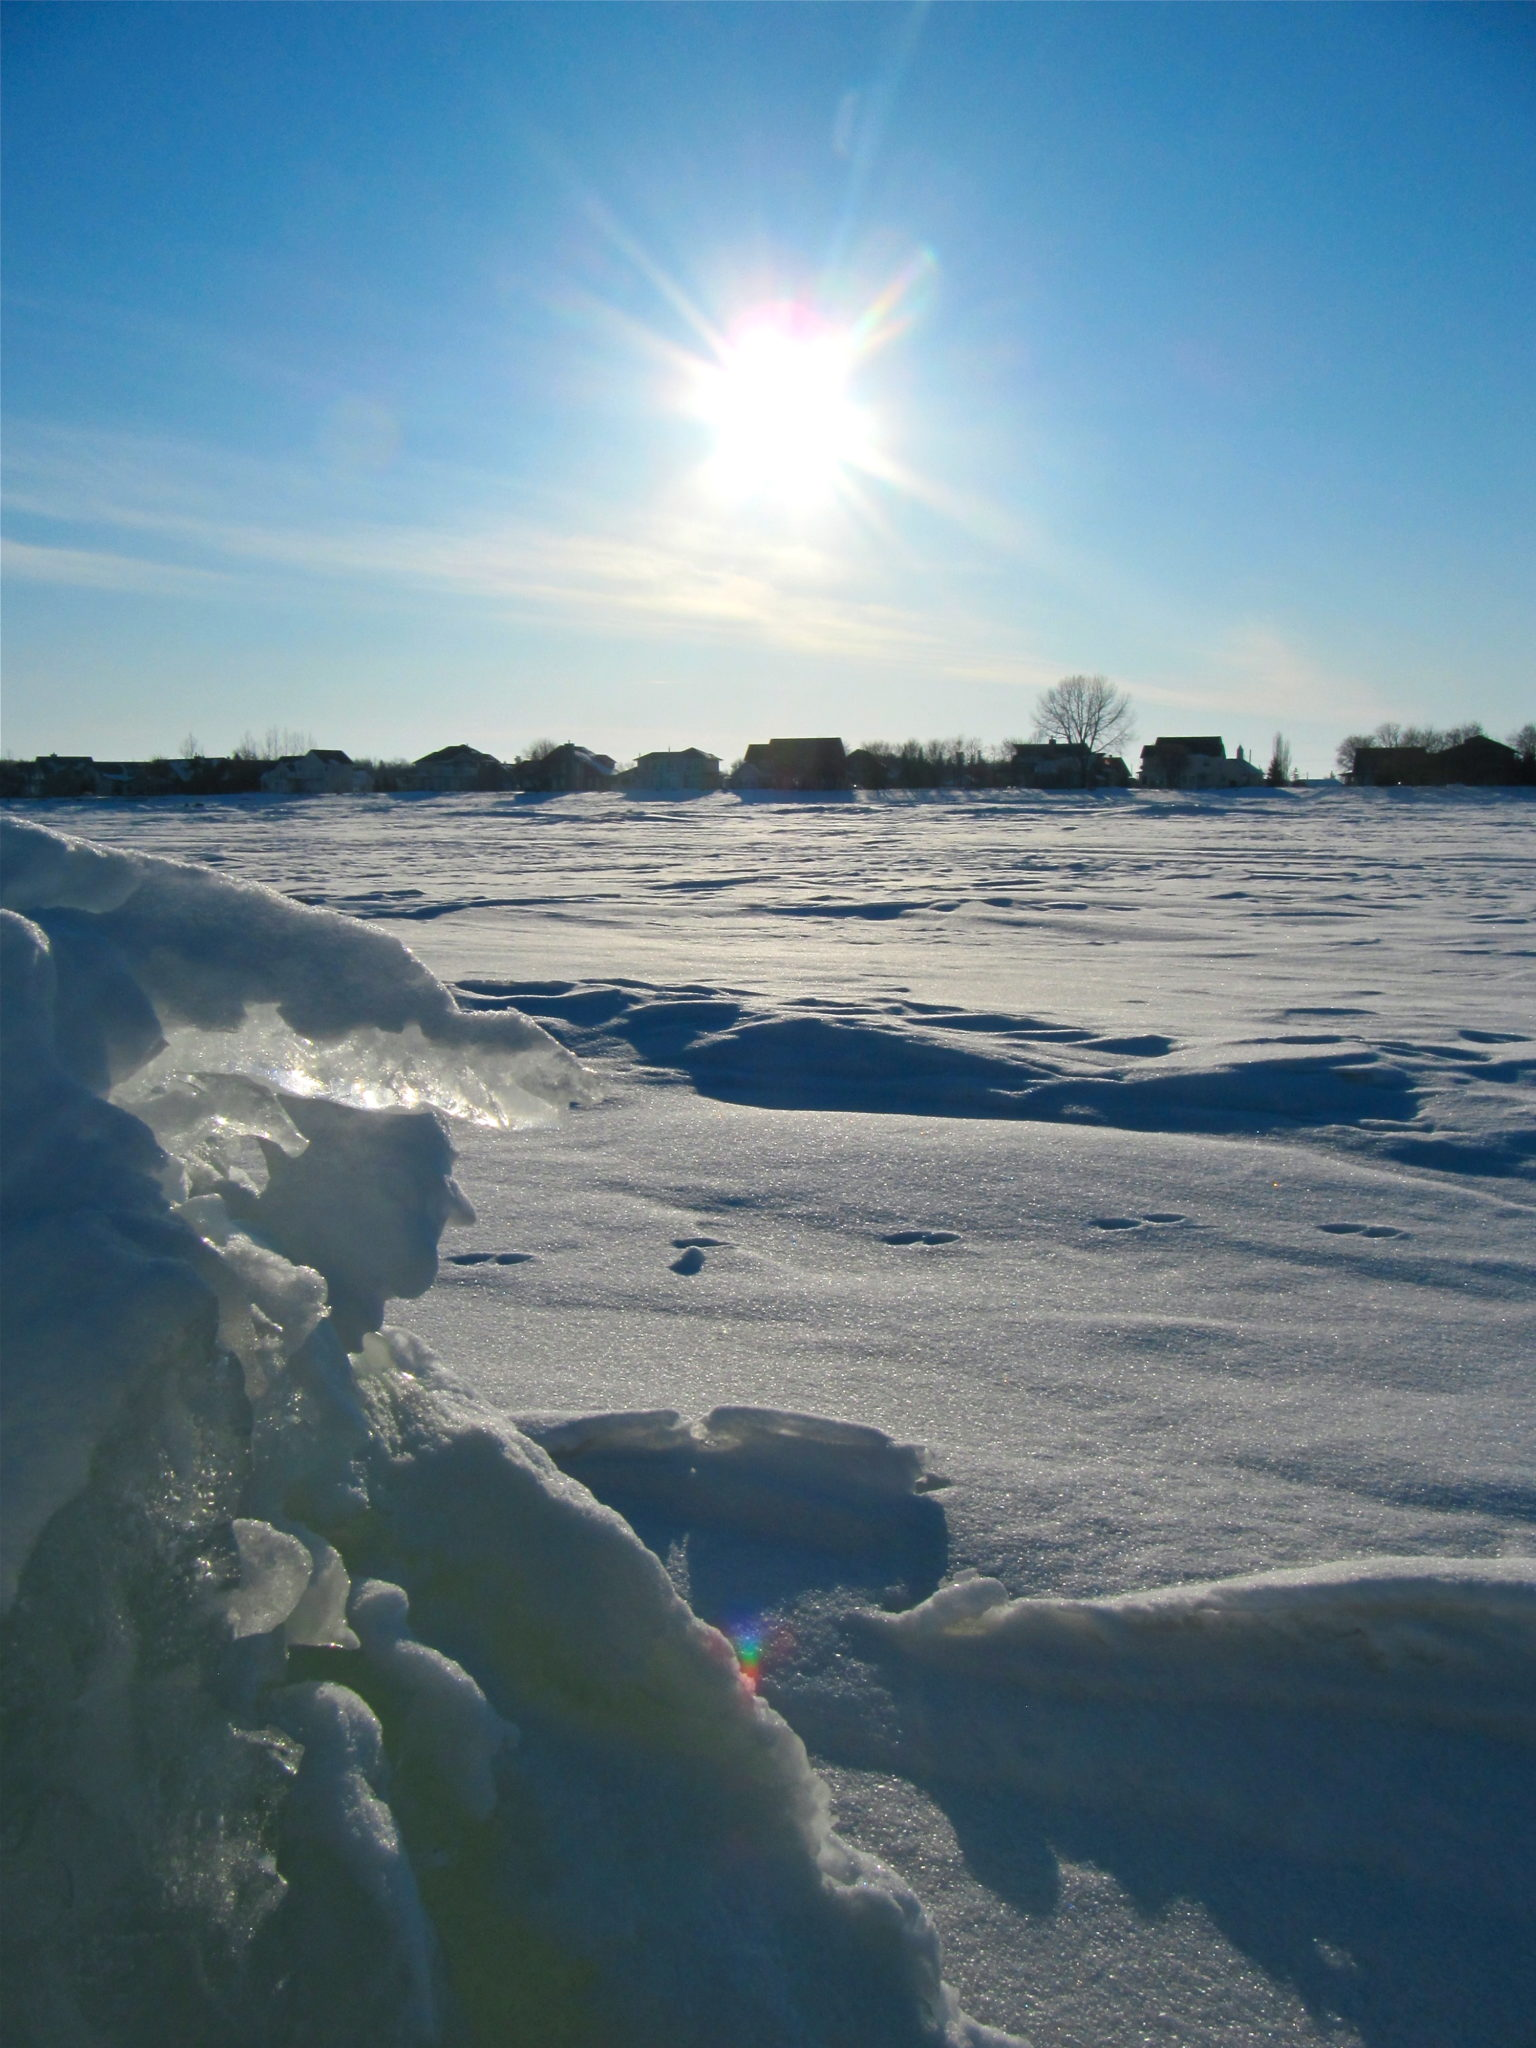 Lake Winnipeg in February - Between Brush Strokes